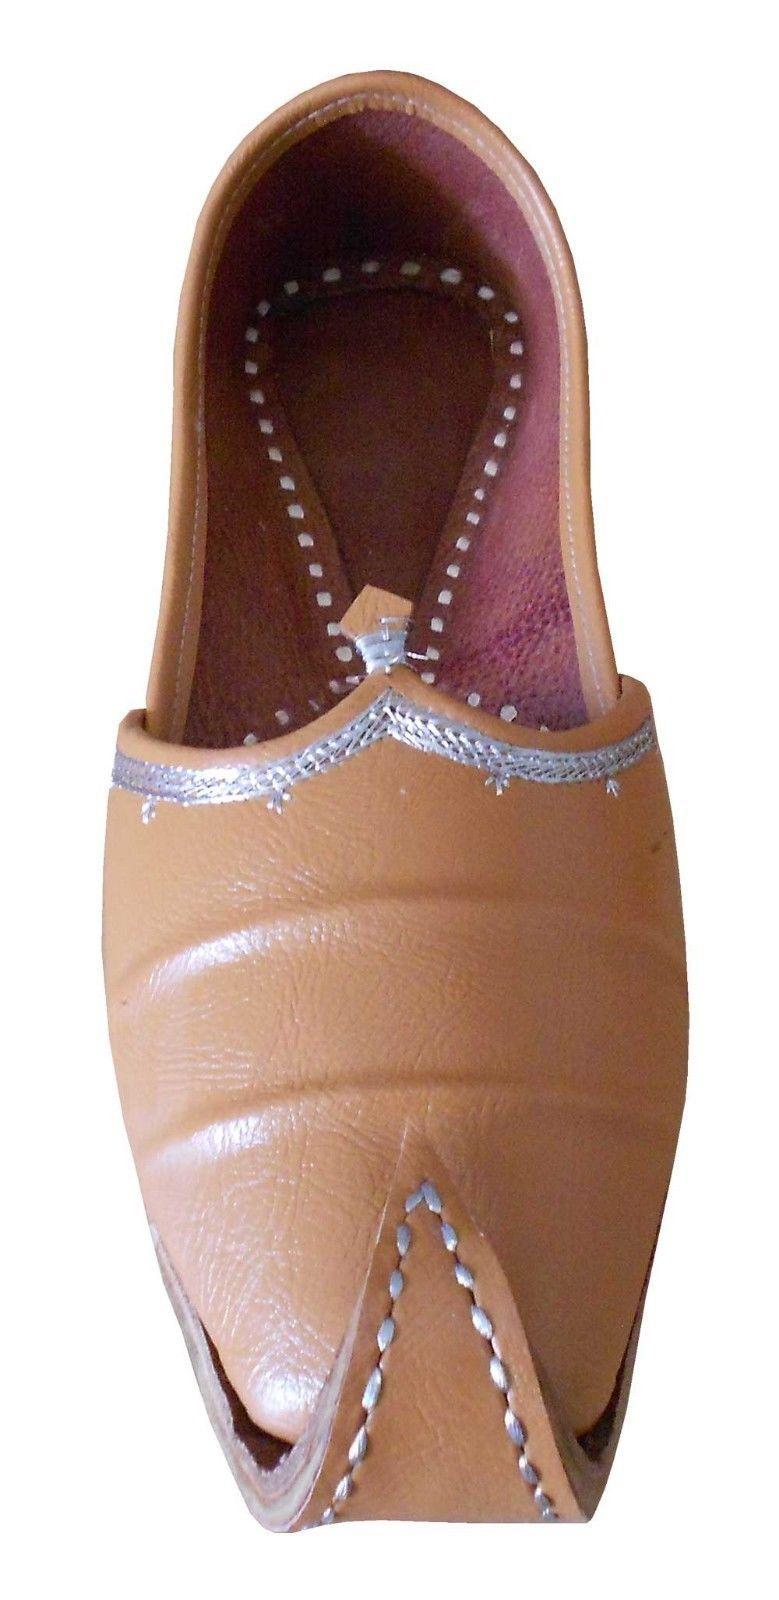 Men Shoes Jutti Indian Brown Handmade Leather Espadrilles Flat Mojari US 10  - $39.99